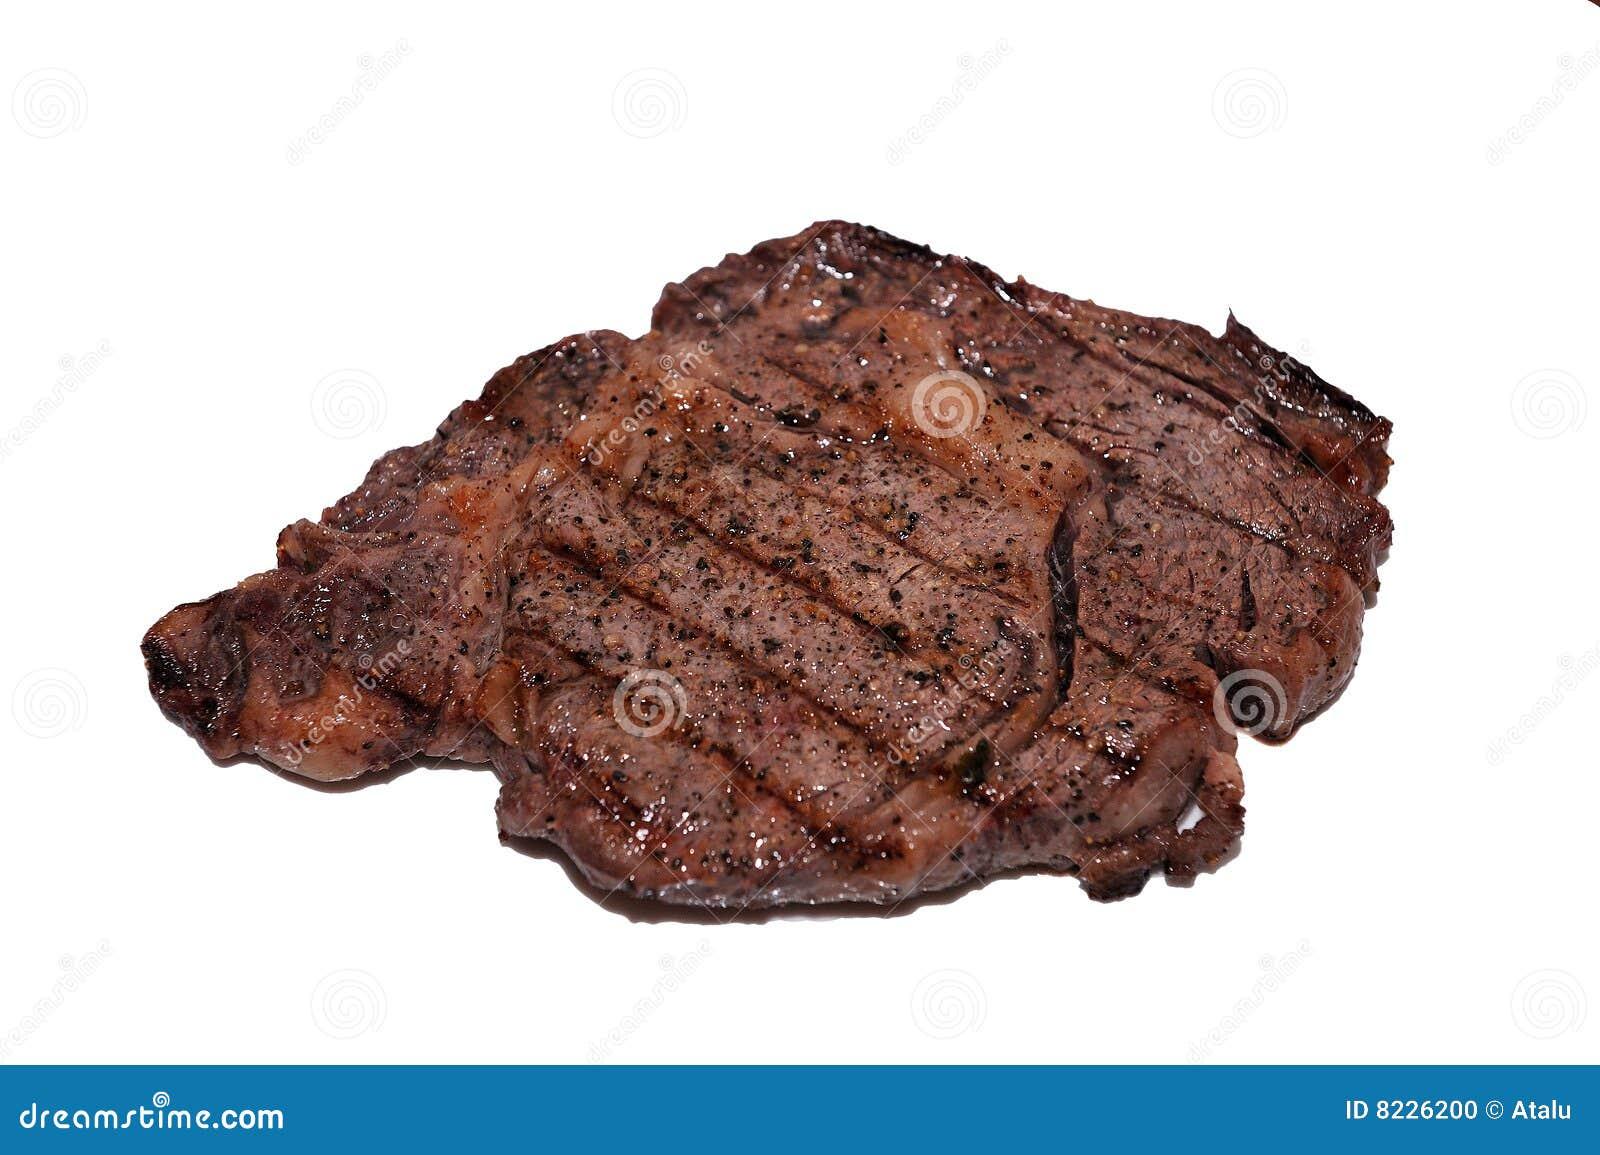 how to cook a juicy ribeye steak